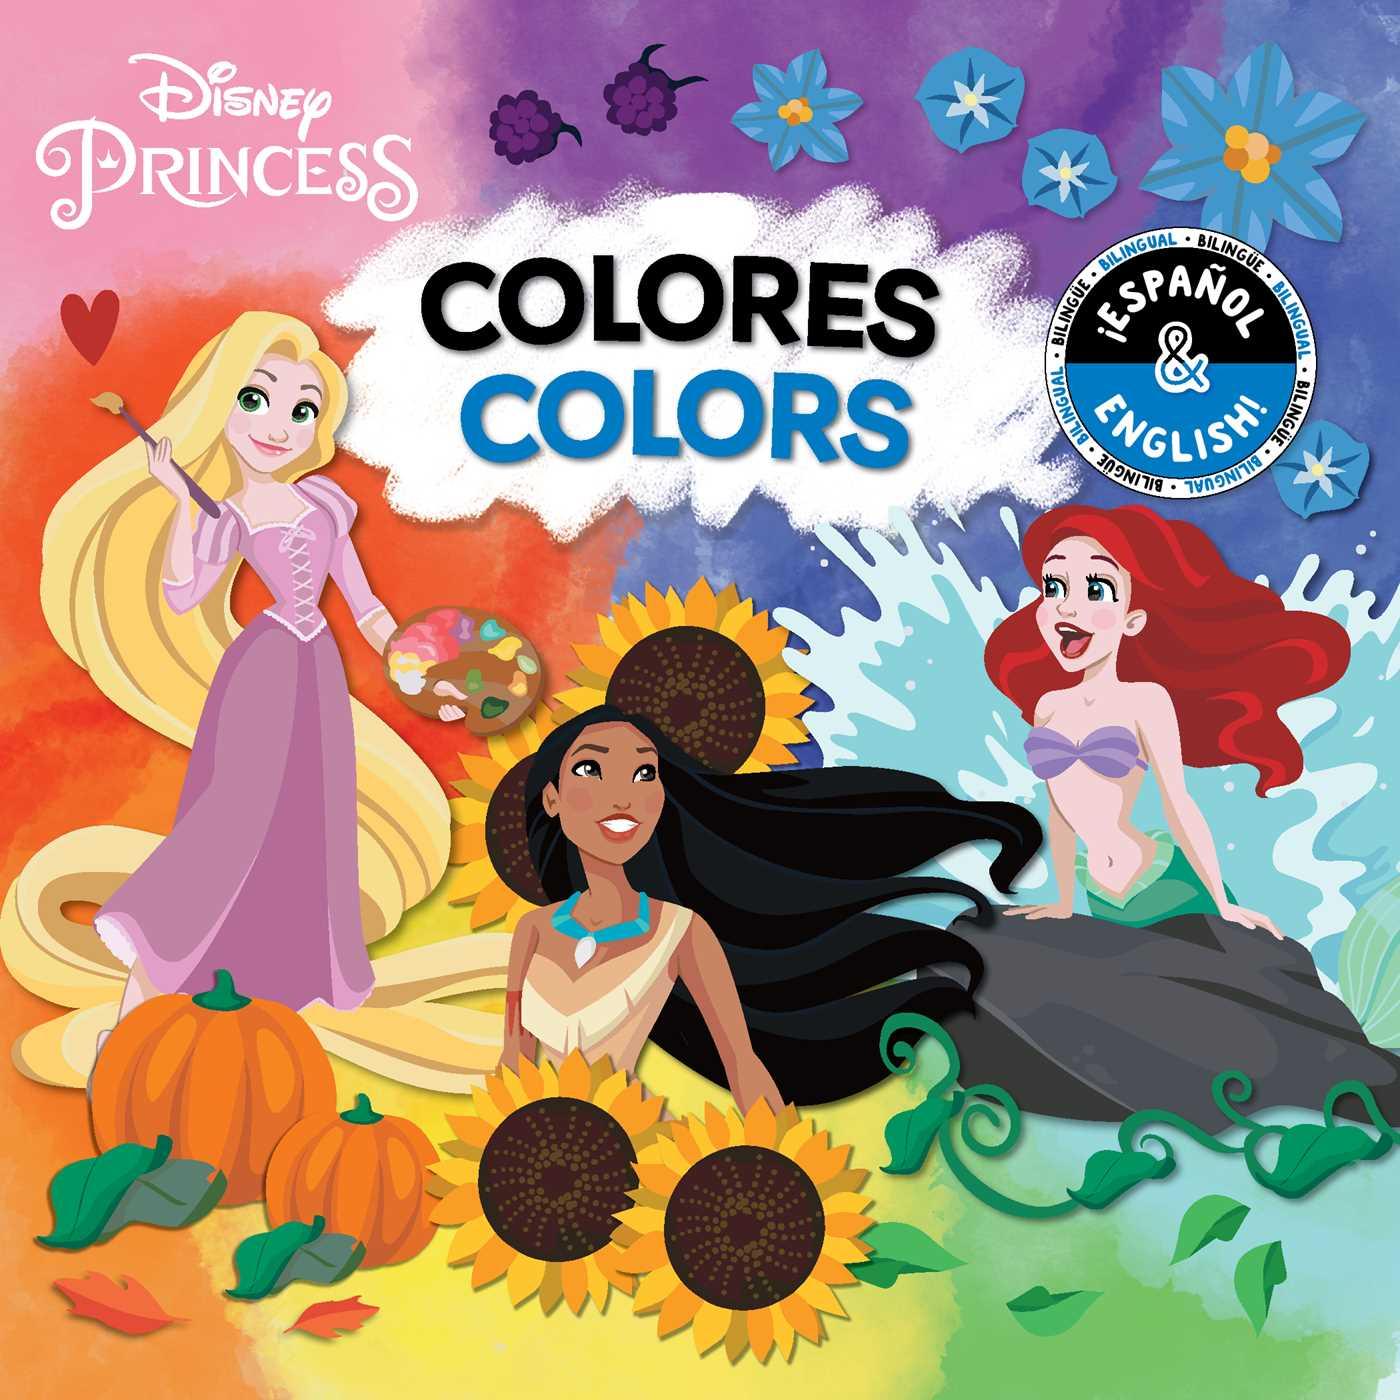 Colors bilingual disney princess 9781499807813 hr